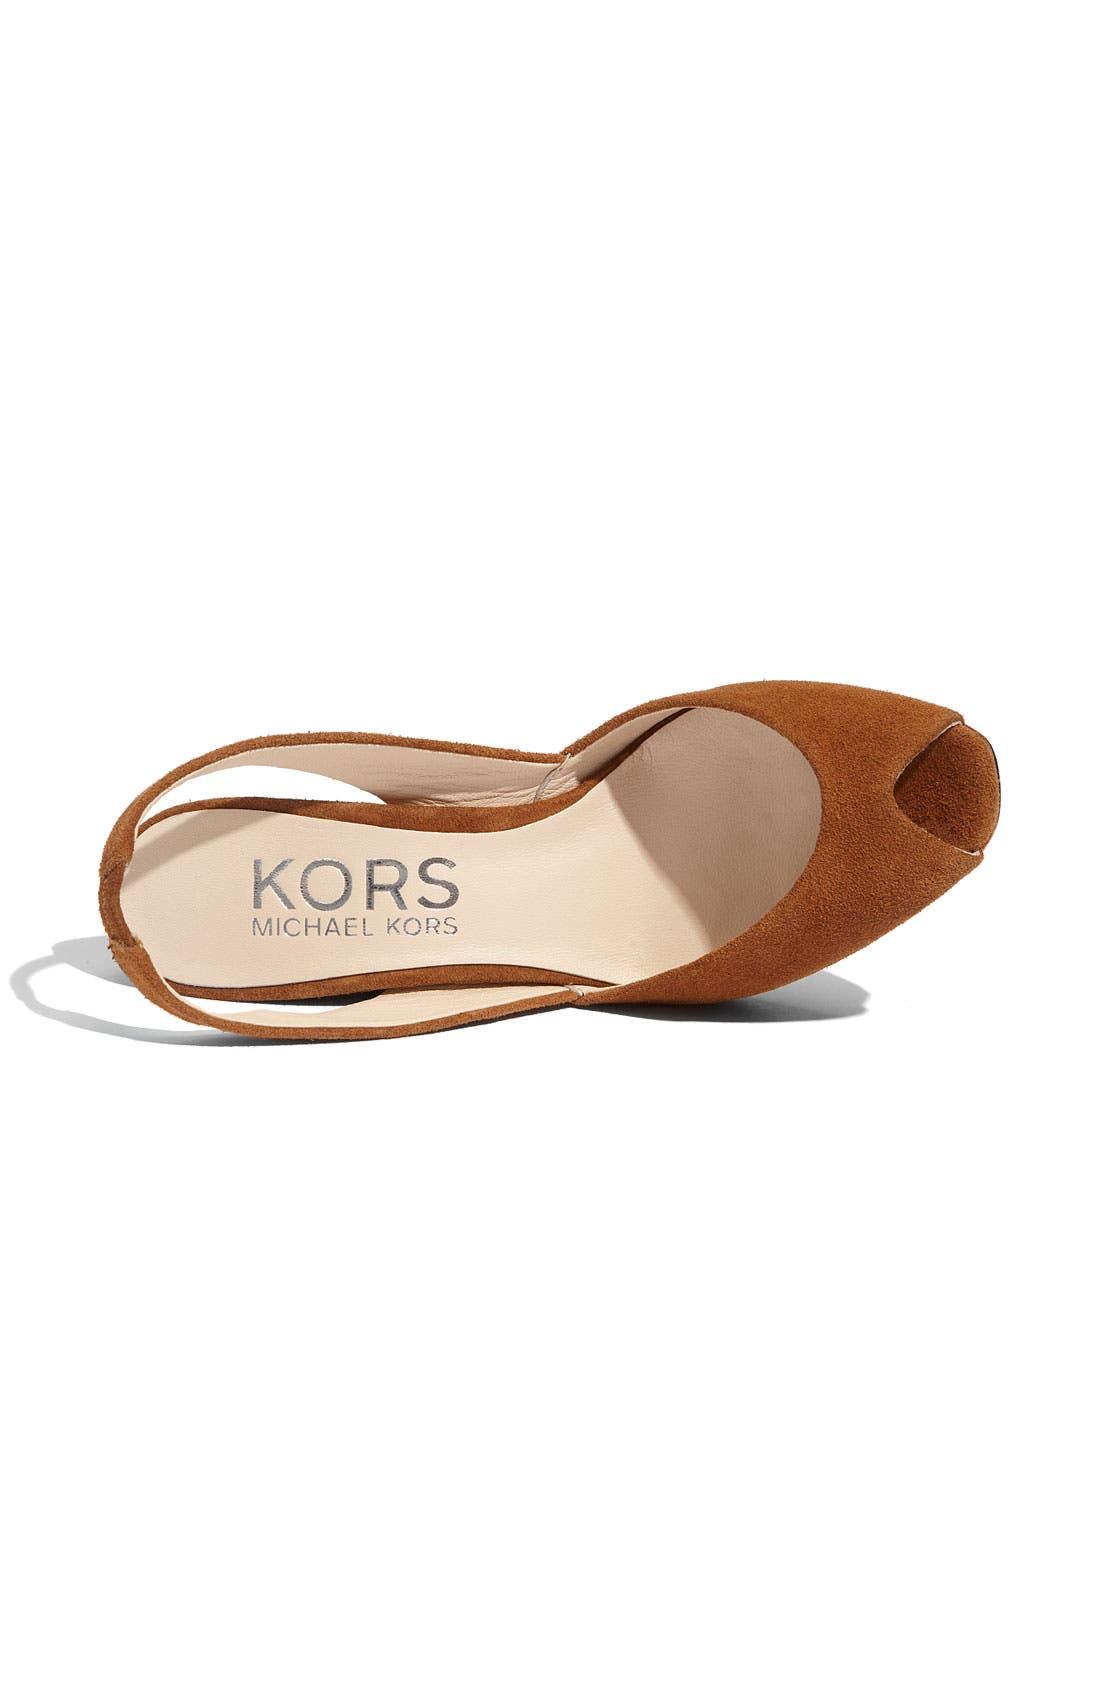 Alternate Image 3  - KORS Michael Kors 'Vivian' Sandal